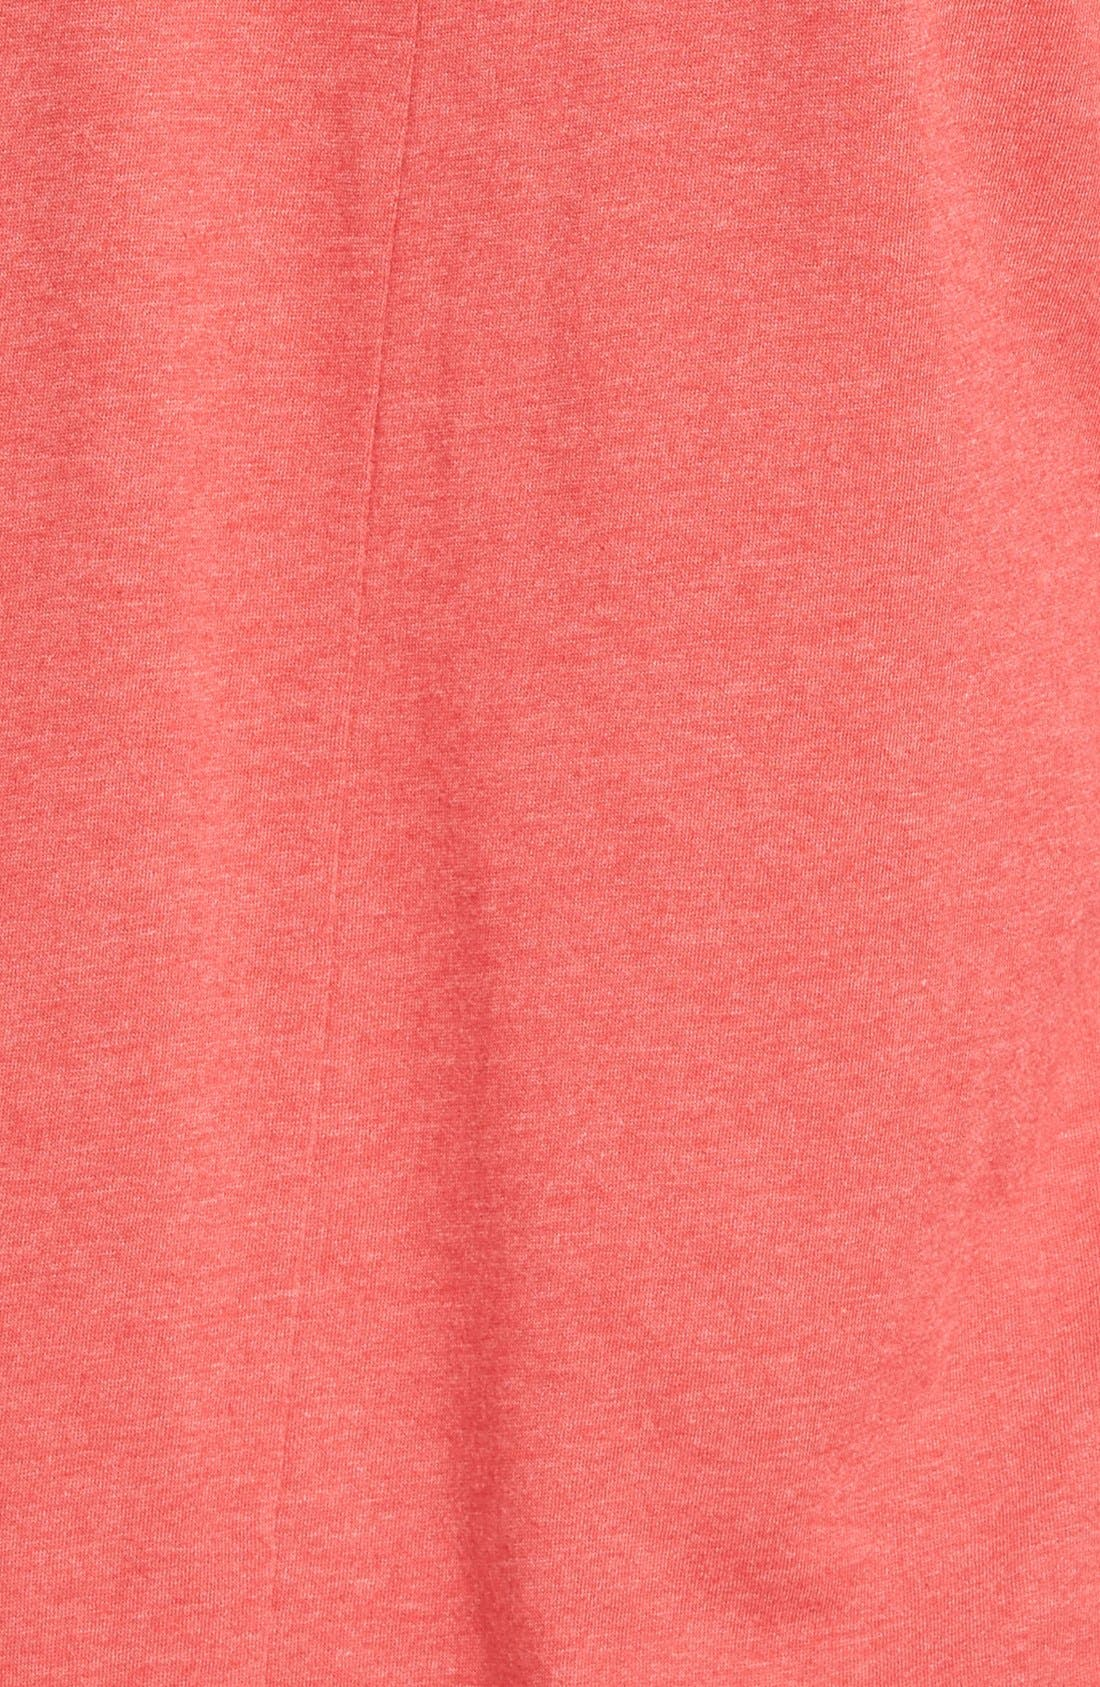 ,                             Scoop Neck Long Sleeve Tee,                             Alternate thumbnail 58, color,                             610